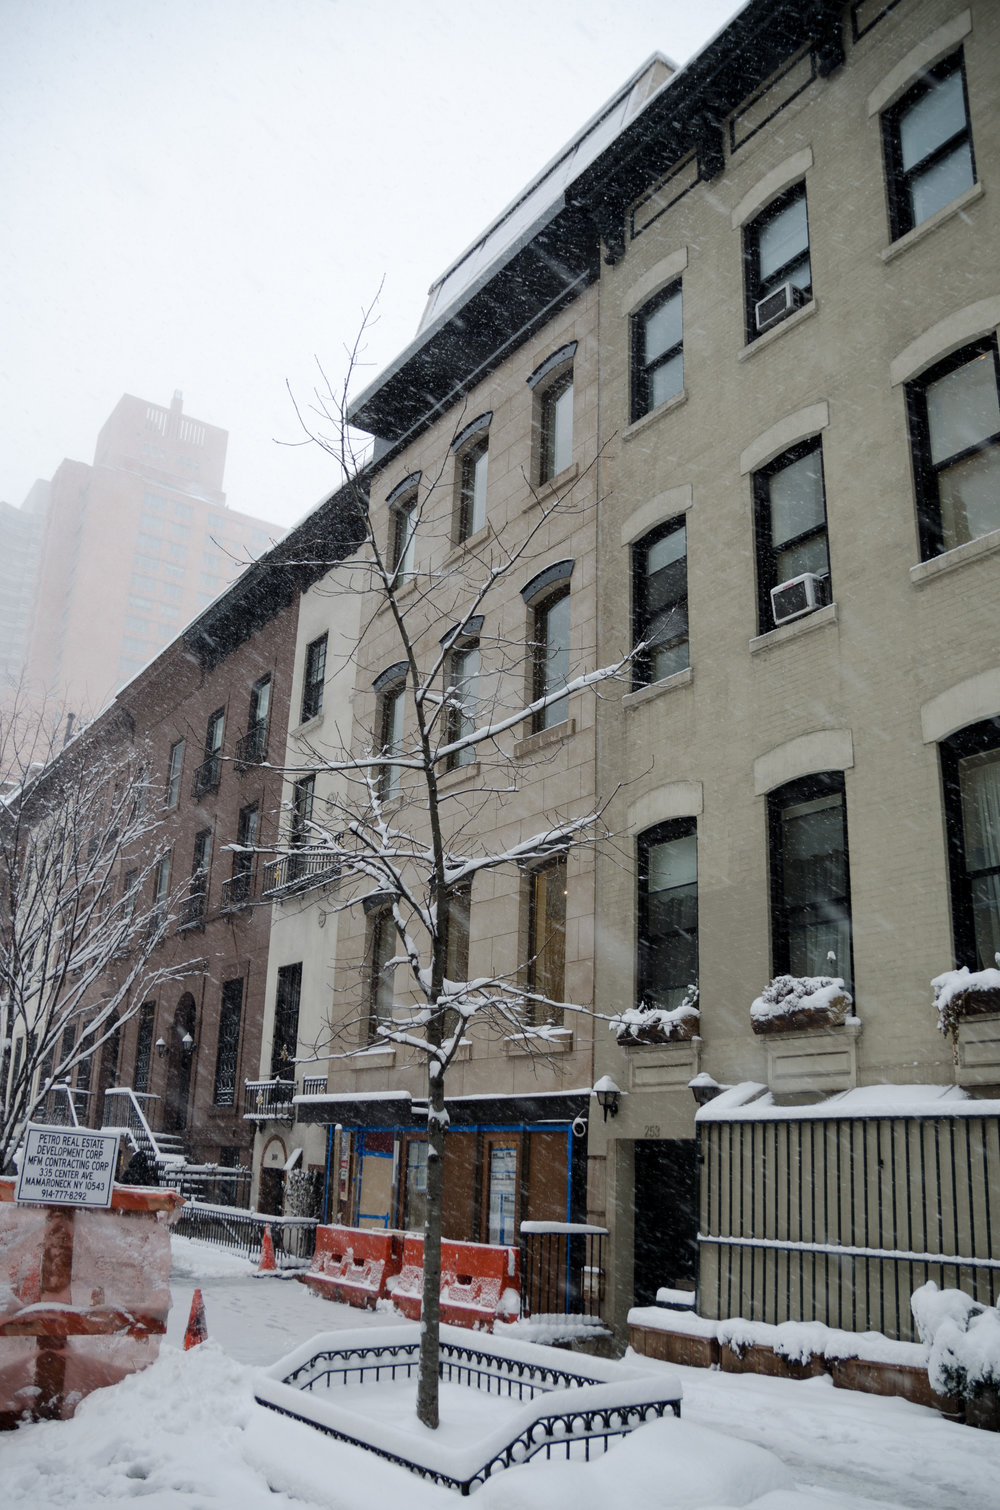 2017-02-09 - Snow Storm-9.jpg